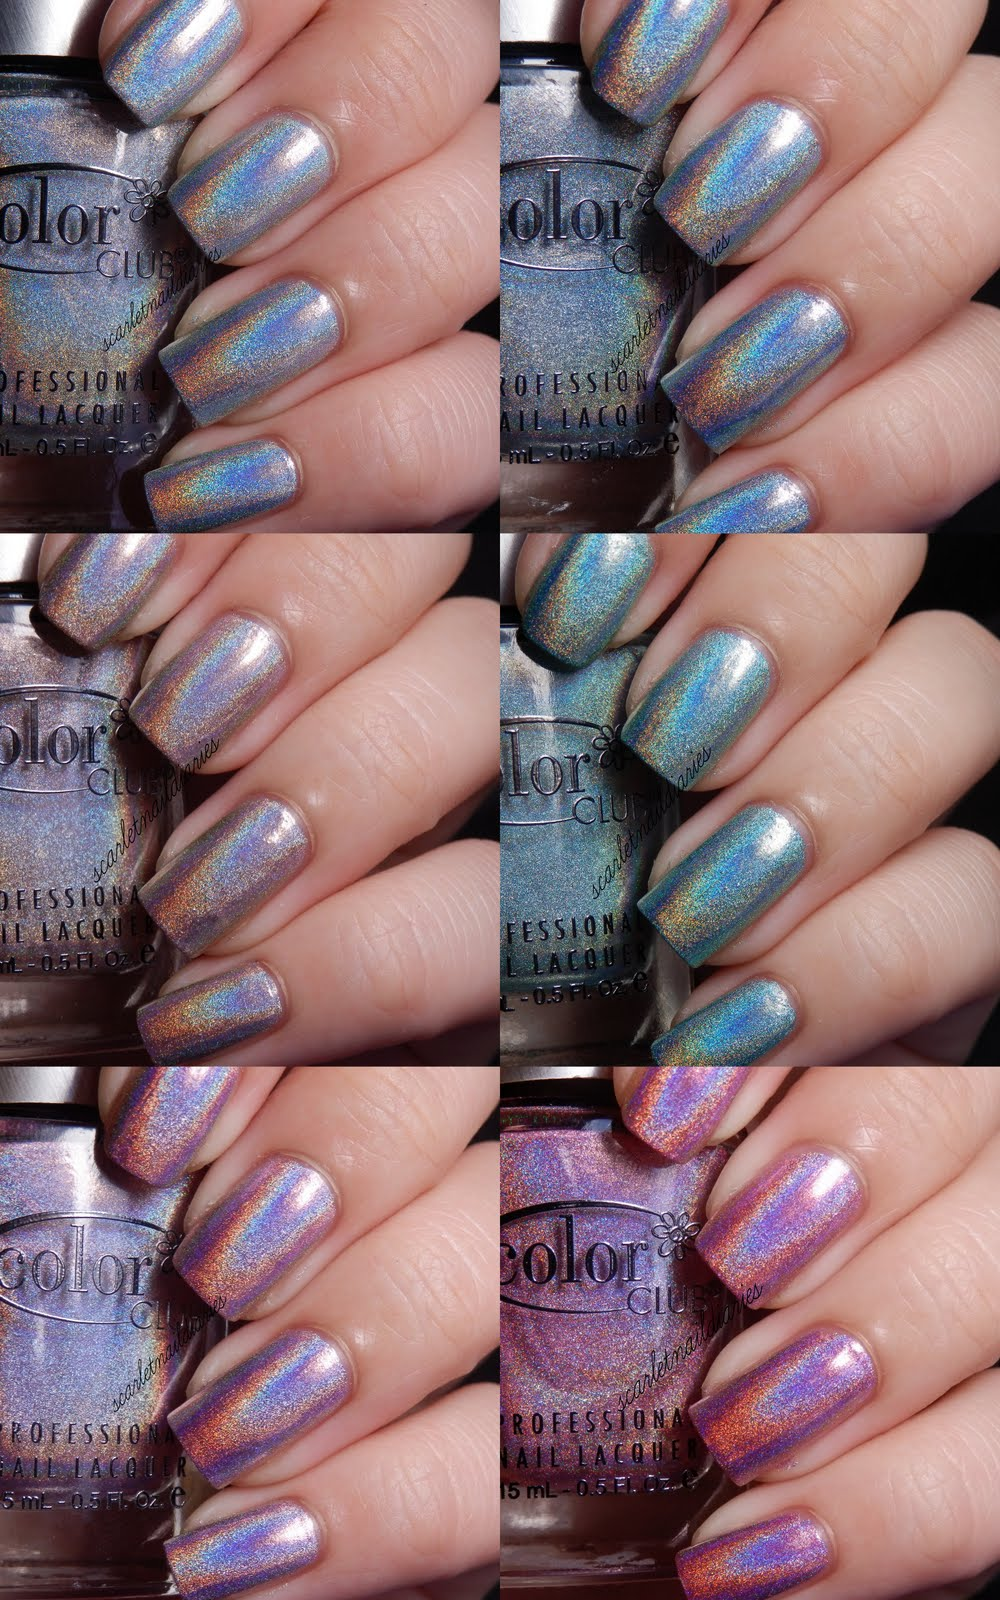 Color Club Holographic Nail Polish Set